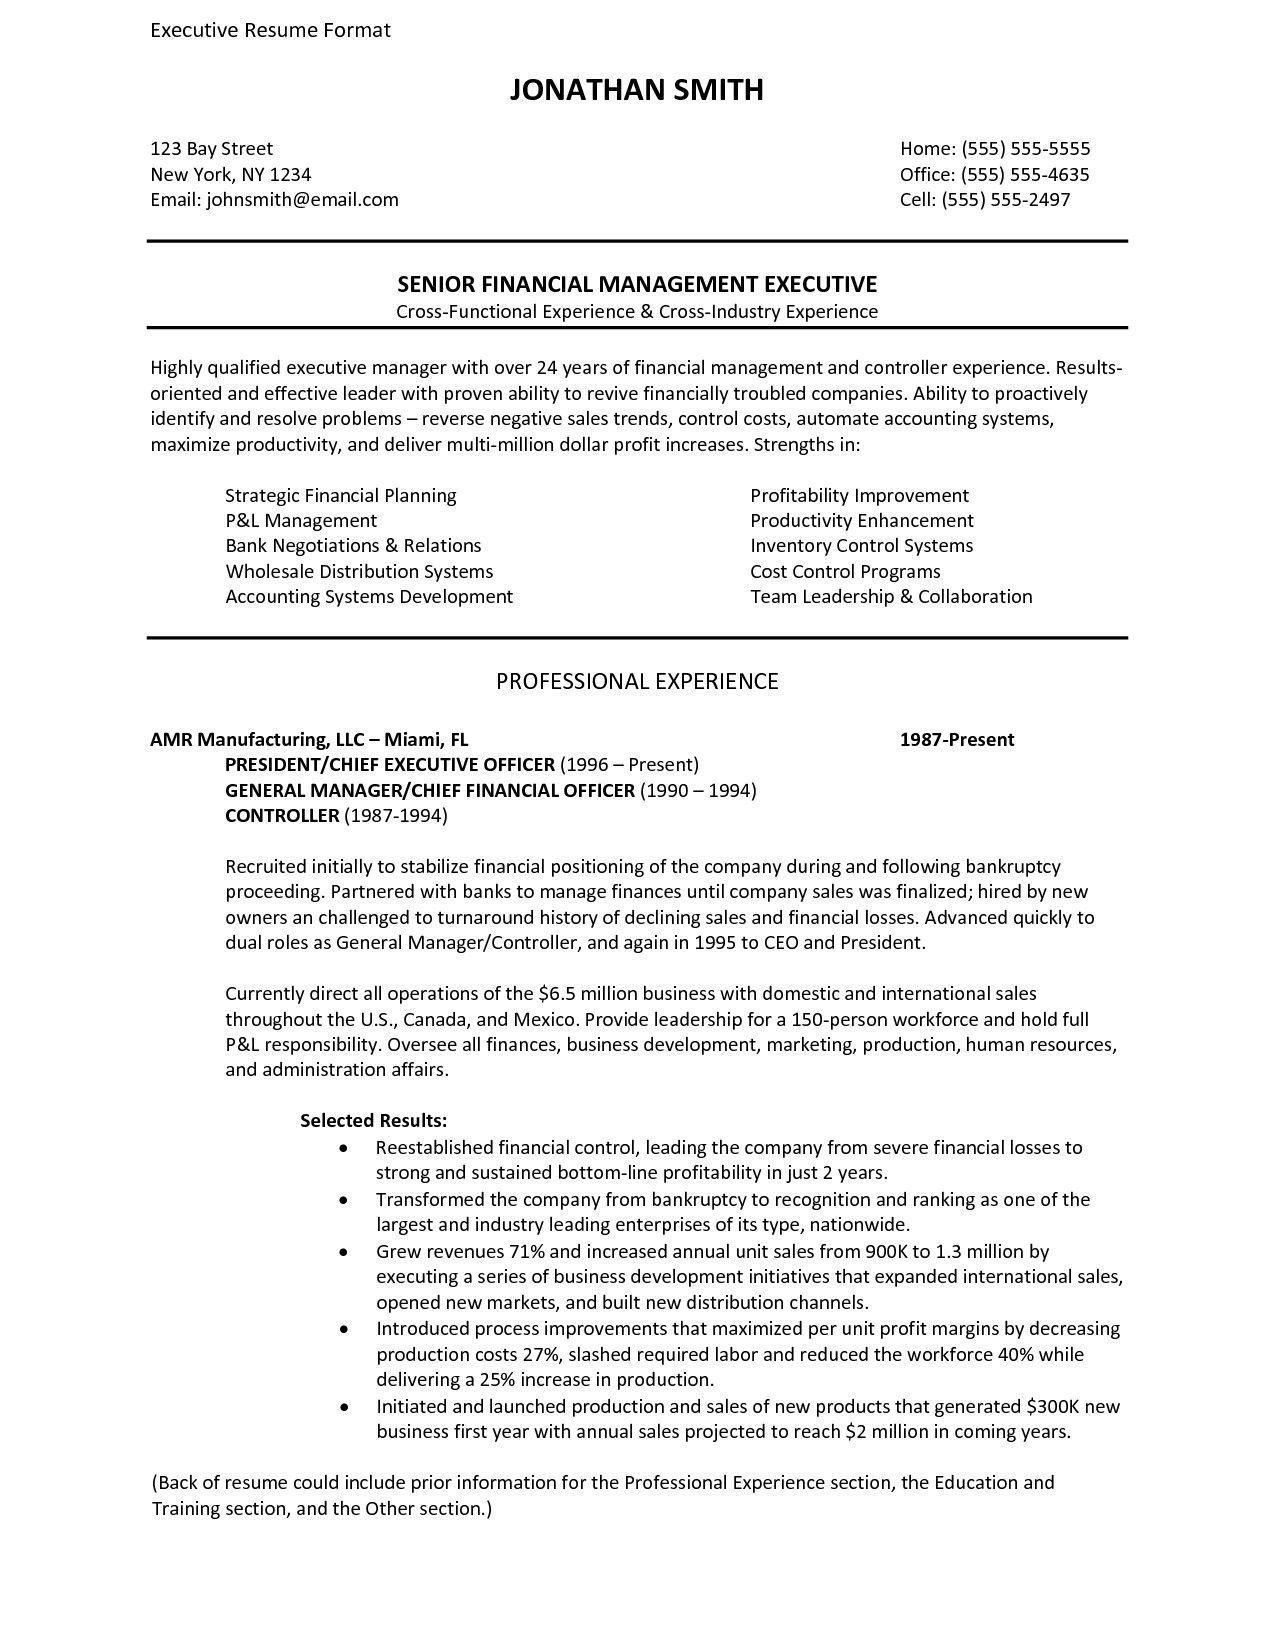 Traditional 2 Resume Format Format Resume Traditional Resumetemplatesfreedownloadable Resumetemp Resume Format Executive Resume Executive Resume Template